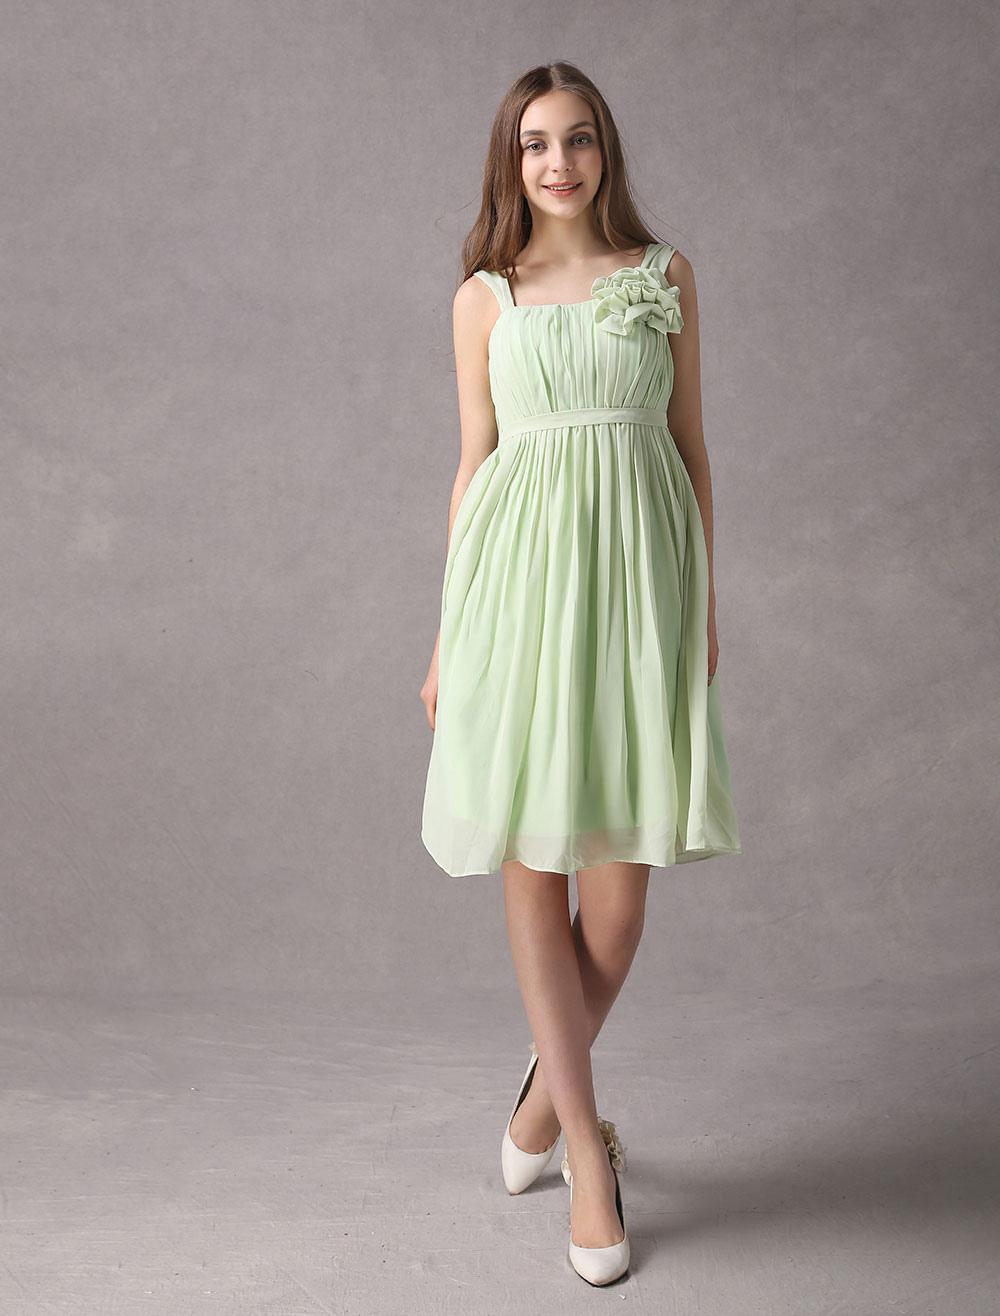 Sage Green Bridesmaid Dress Square Neckline A Line Chiffon Short Wedding Party Dress (Bridesmaid Dresses) photo